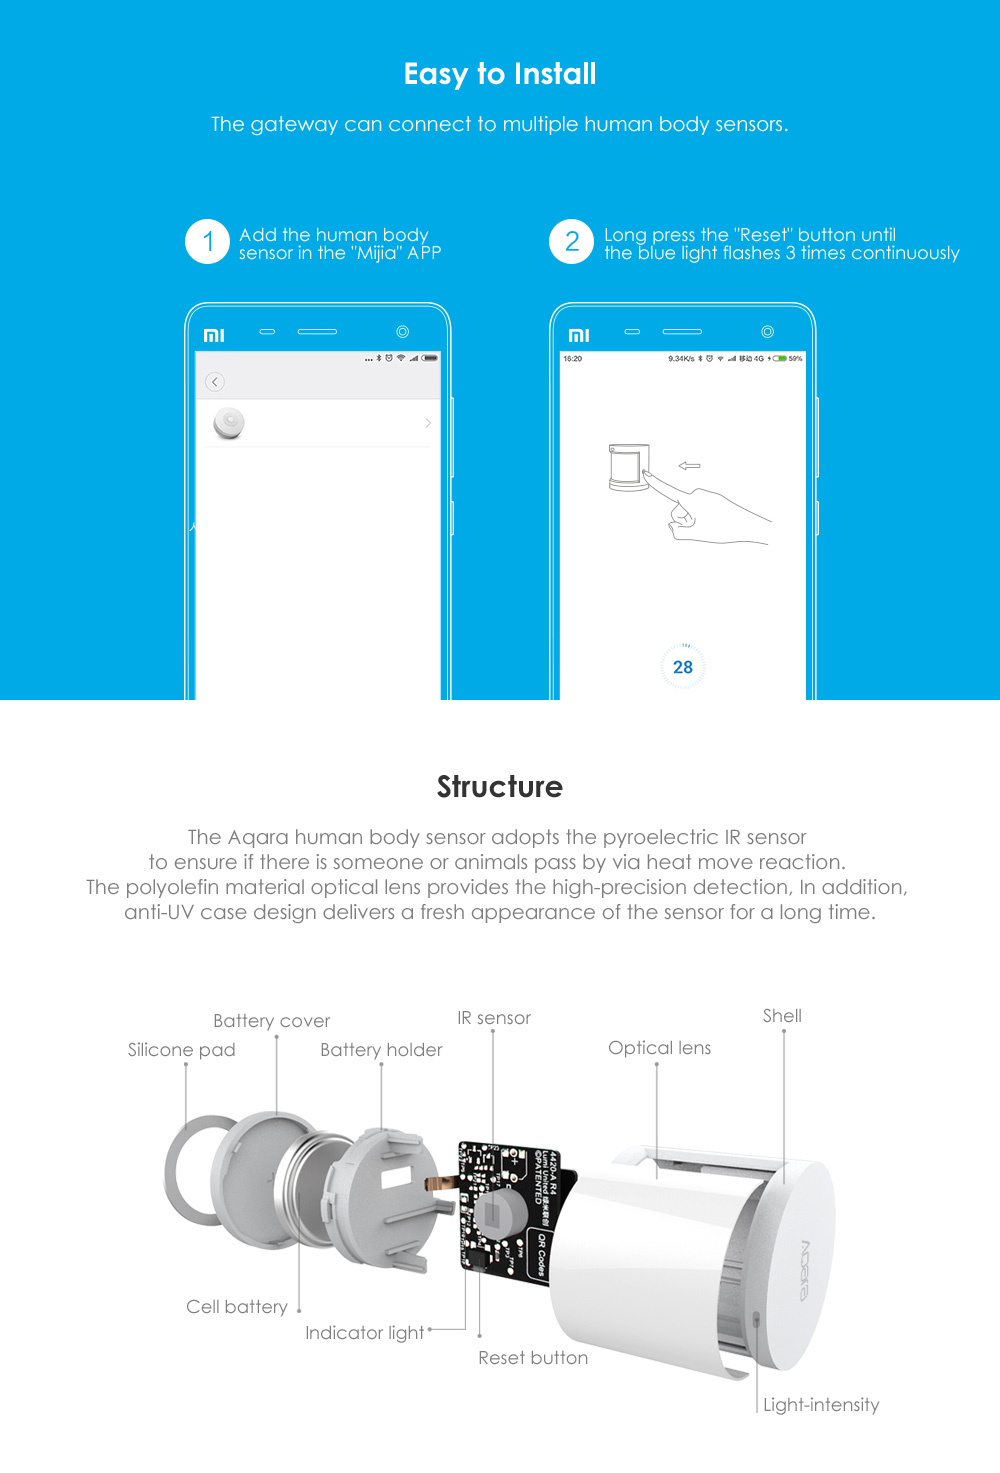 Xiaomi Aqara Body Sensor&Light Intensity Sensors, Zigbee Wireless WiFi With Holder Smart Mi Home APP for Gateway Hub iOSAndroid (32)